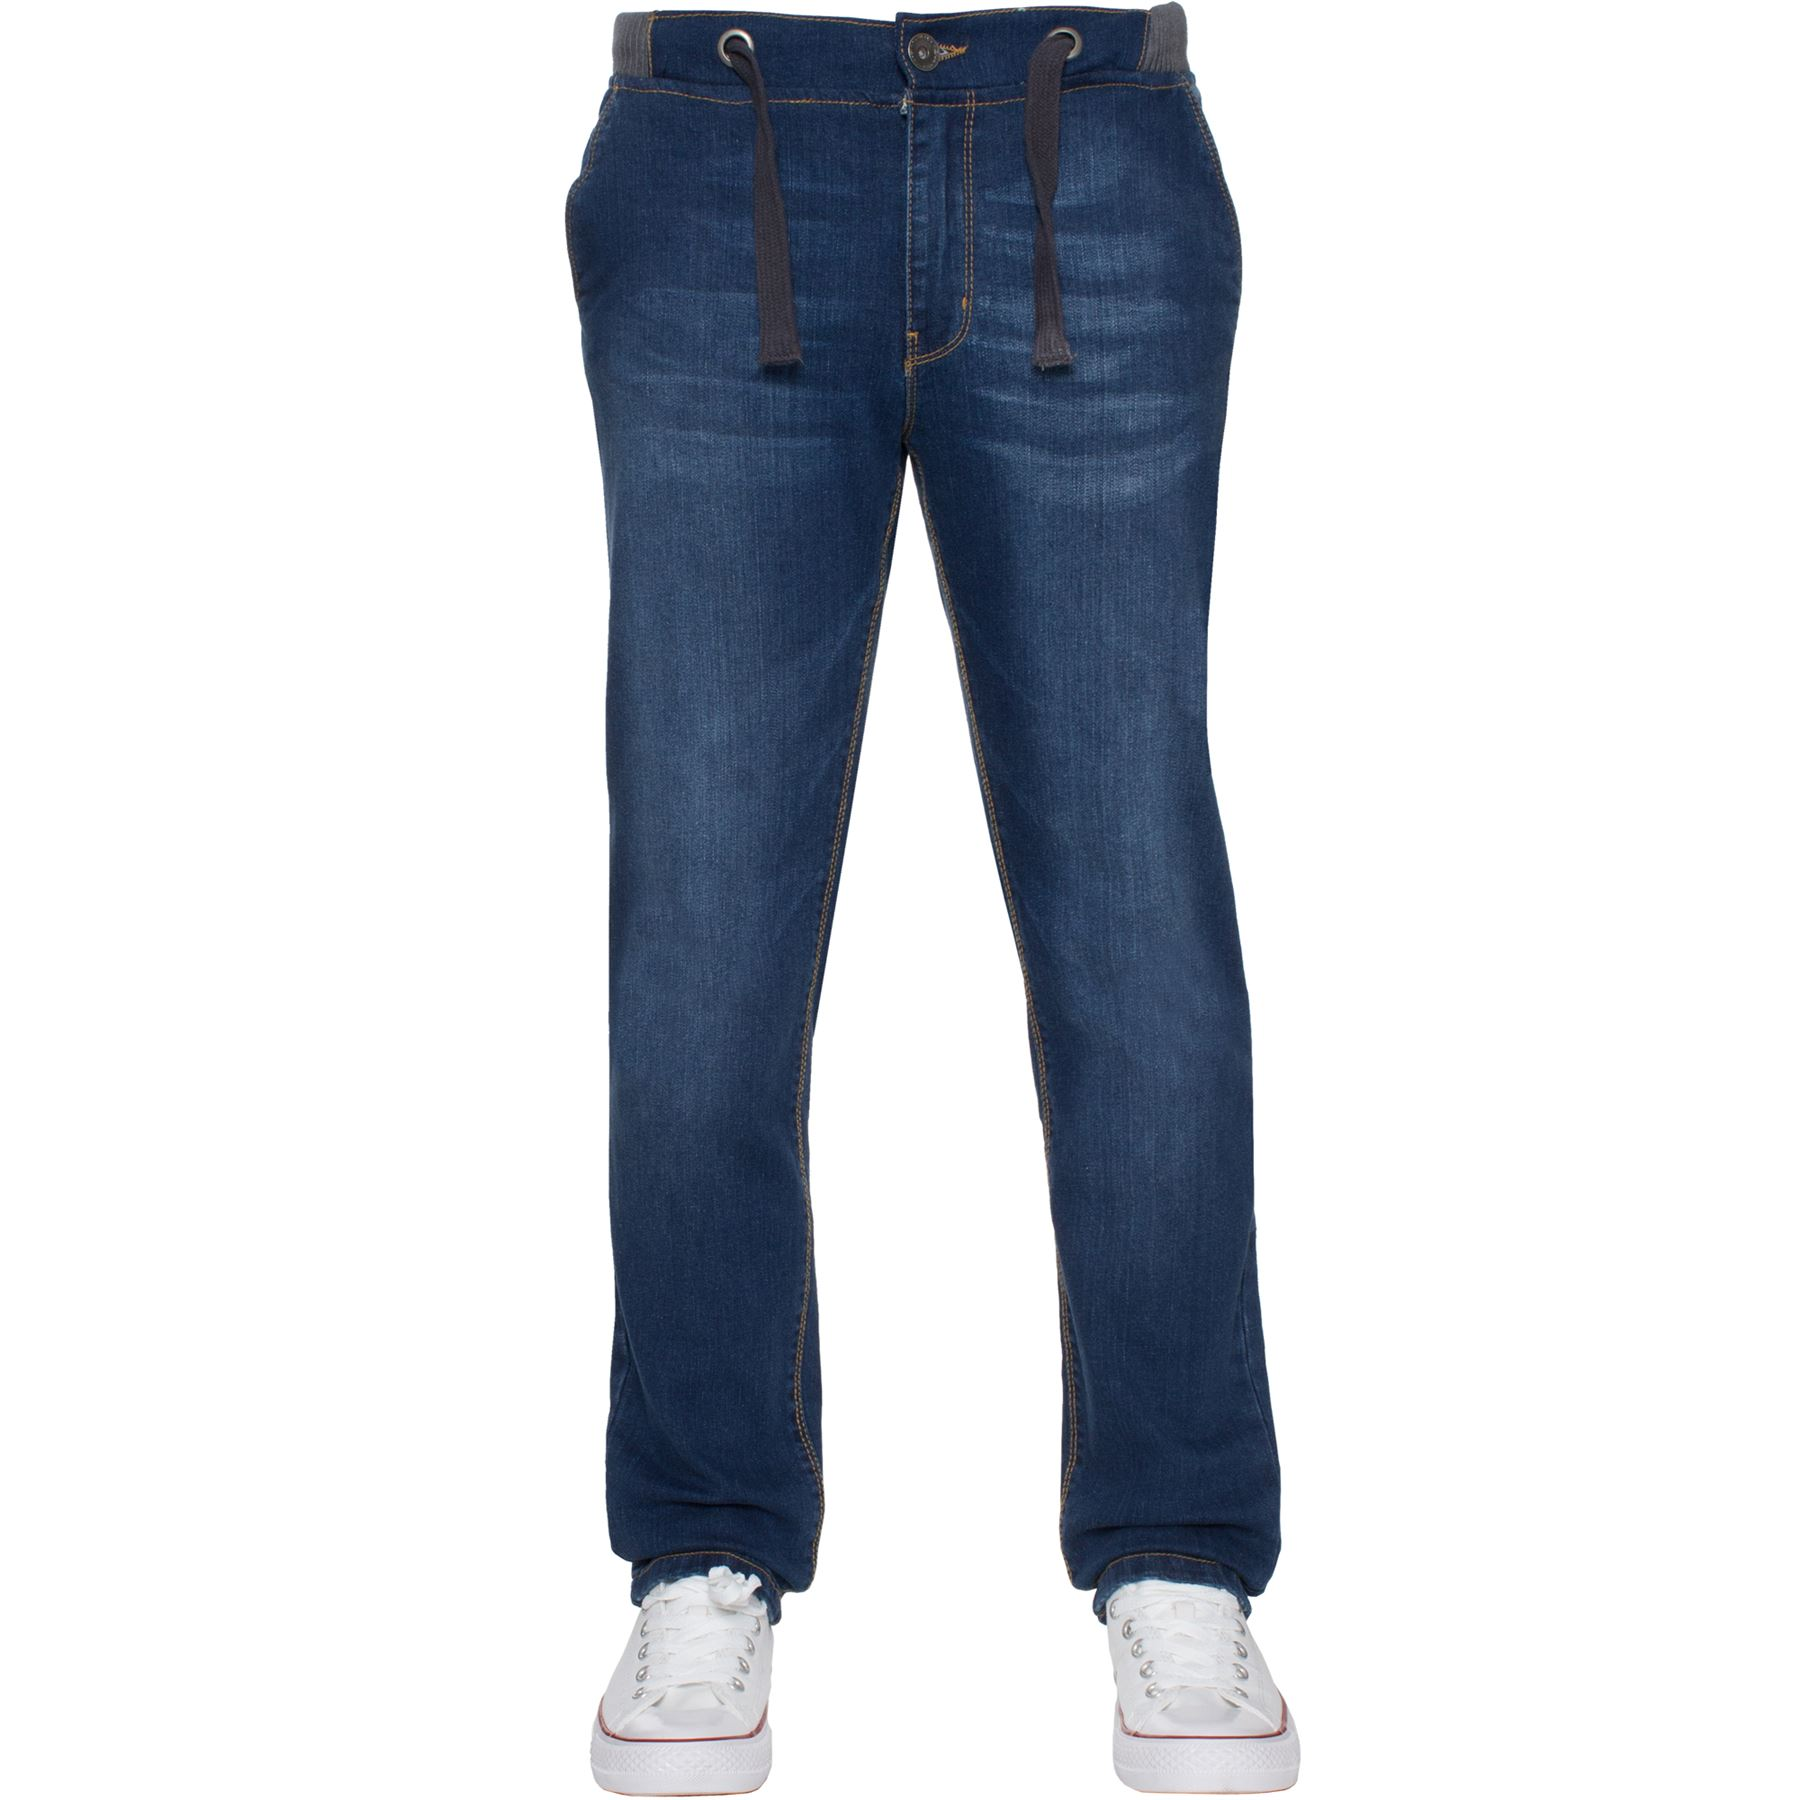 Jean-Garcon-Taille-Elastique-Enfants-Skinny-Stretch-School-Denim-Pantalon-Pantalon miniature 10